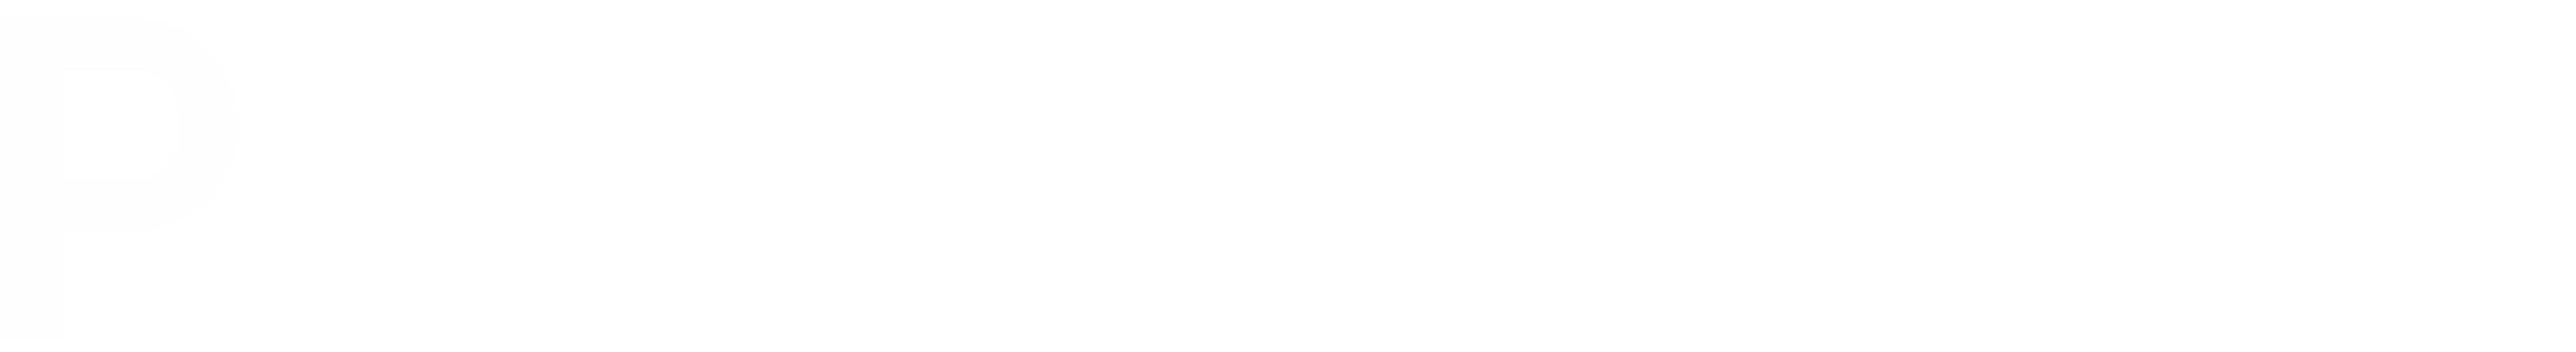 Pilotbase logo white